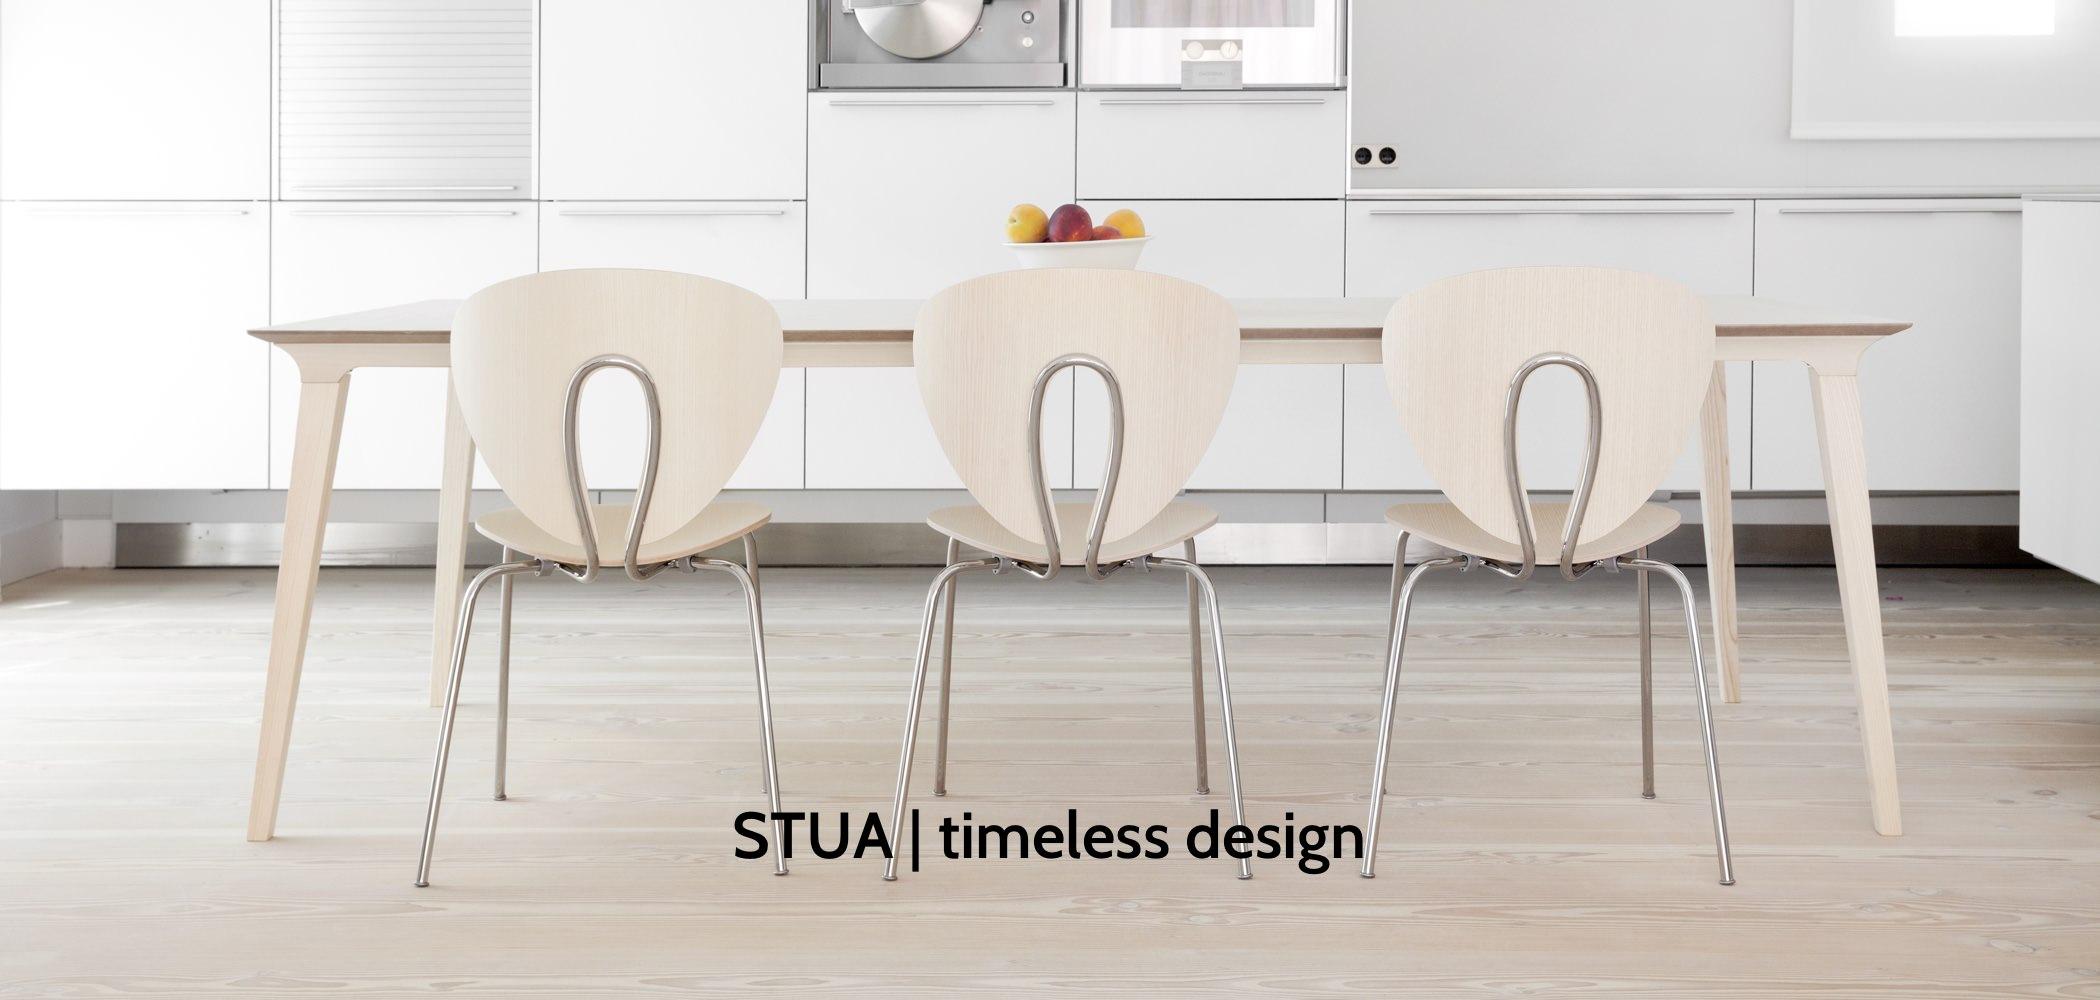 Stua Timeless Design